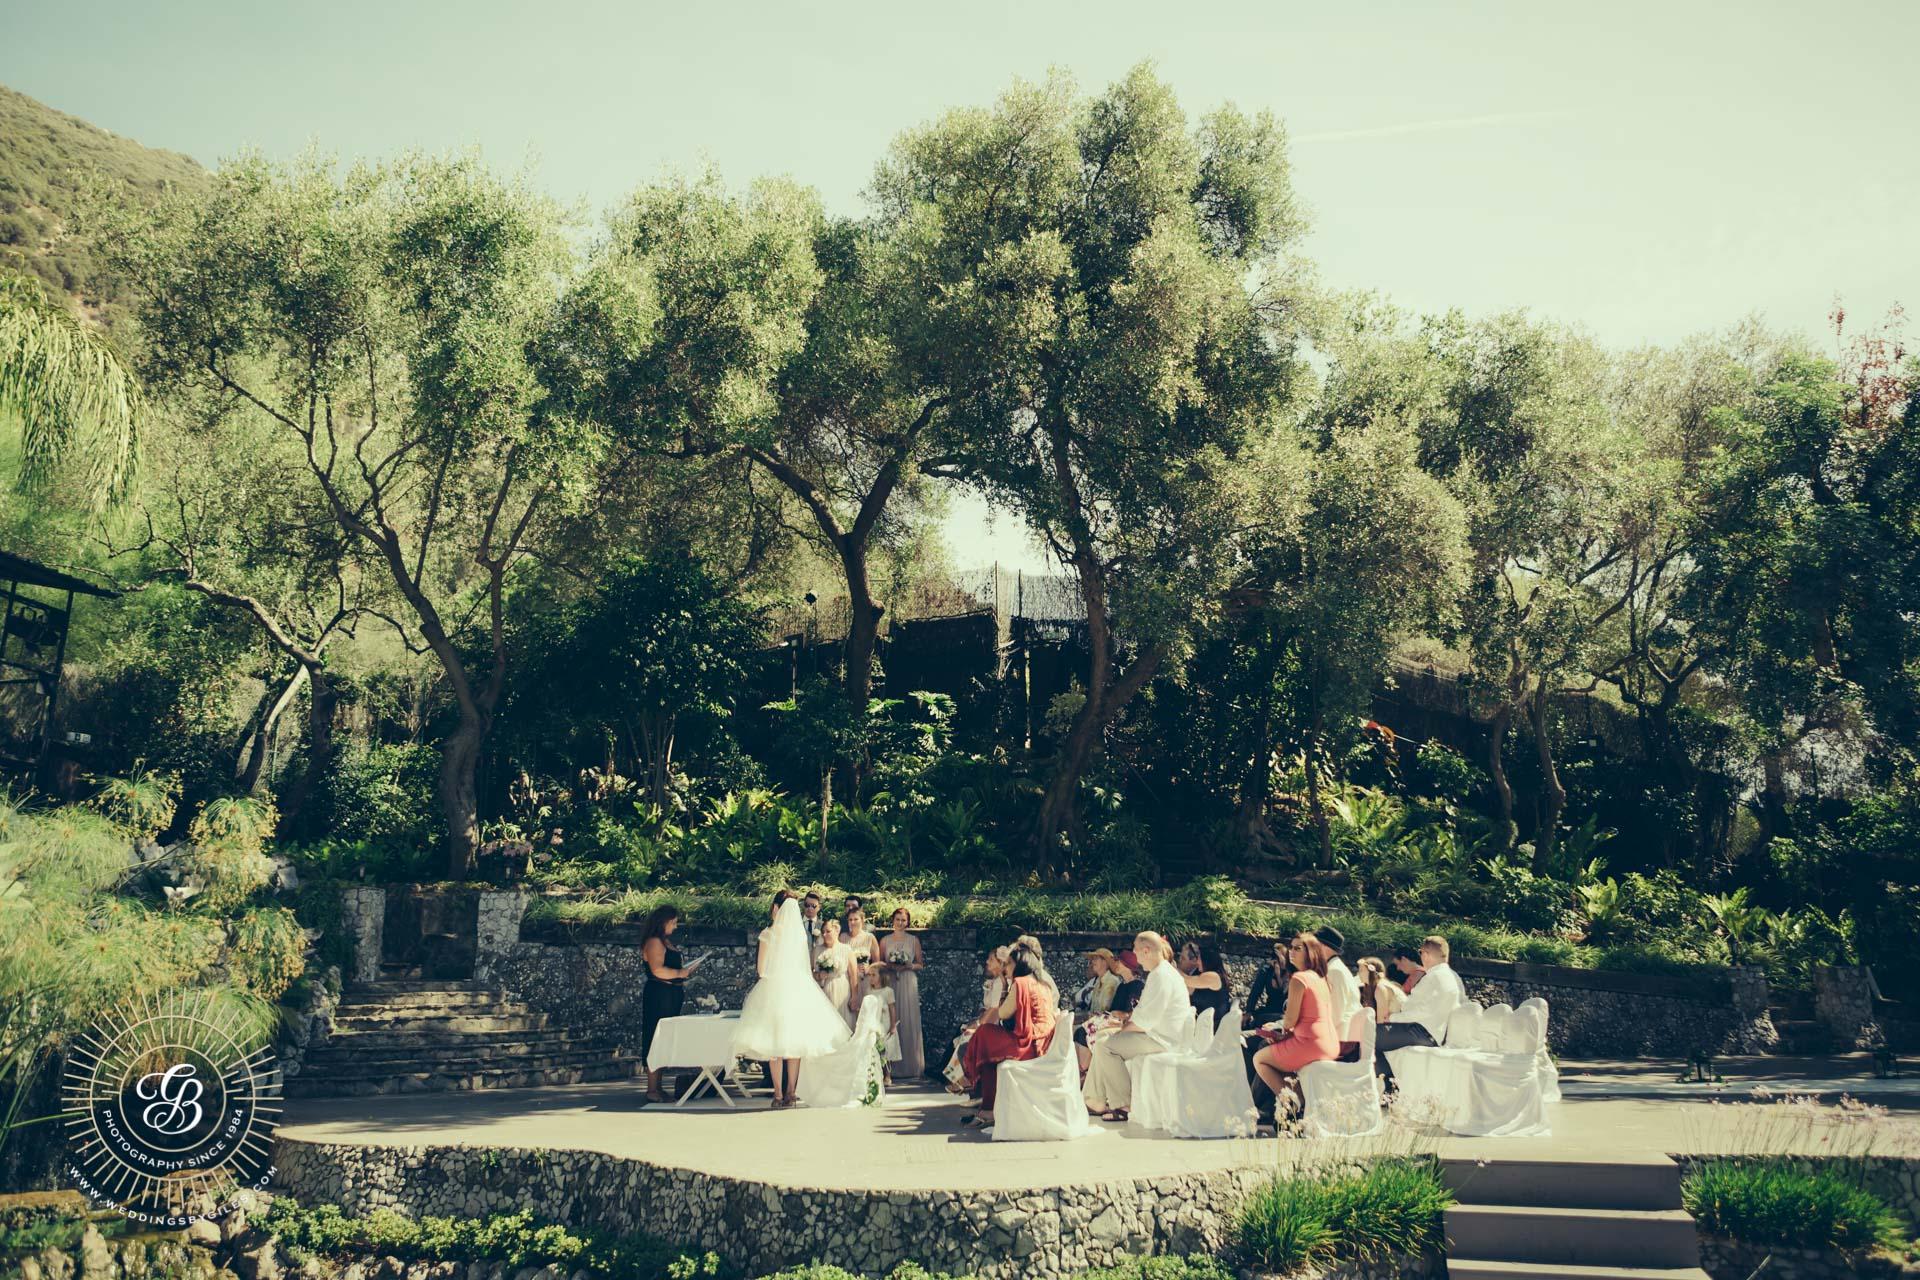 wedding in the open air thearte in Gibraltar